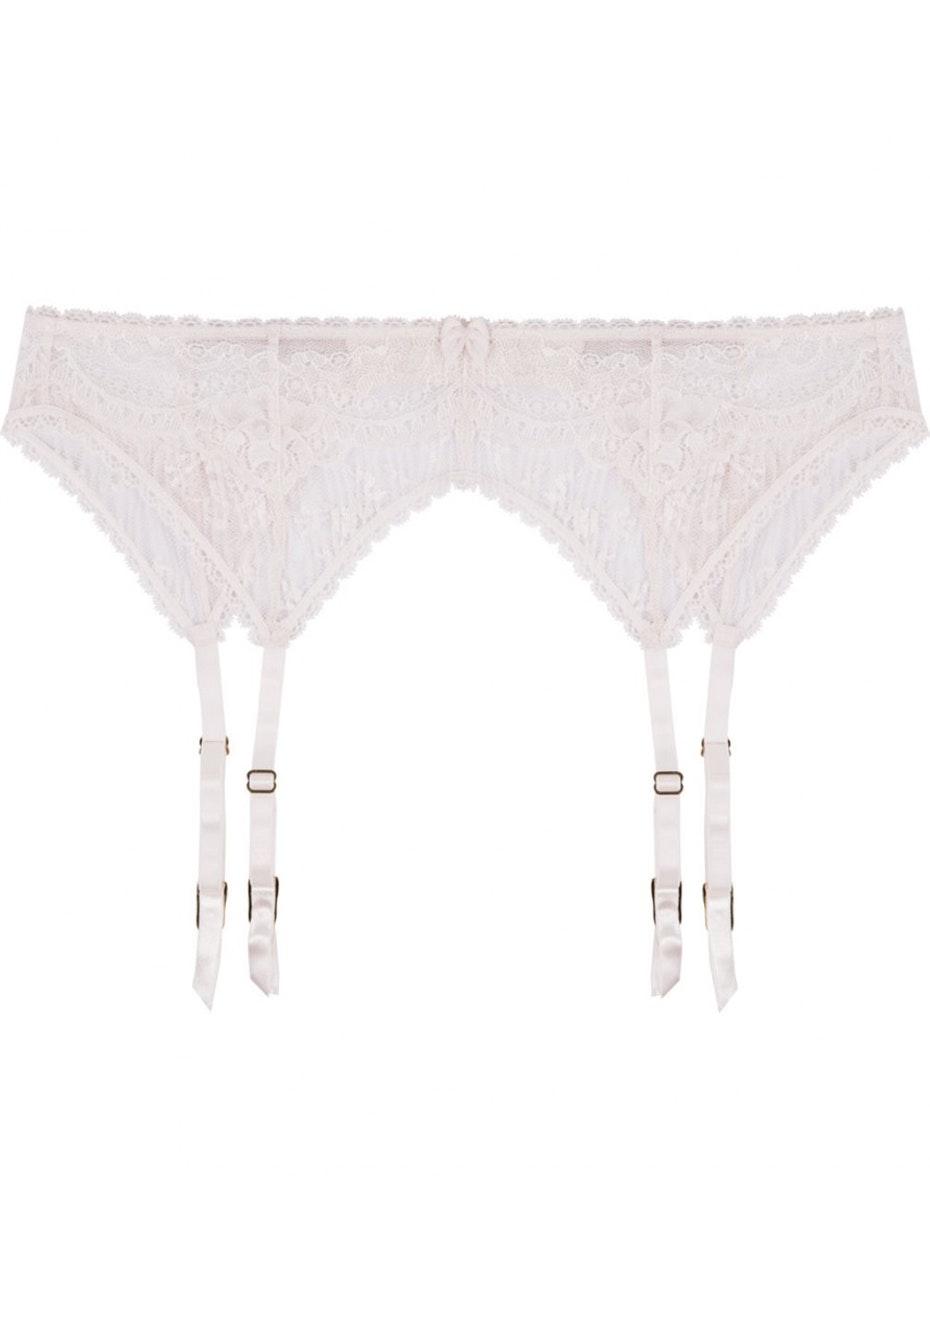 Stella McCartney - Kate Kissing Suspender Belt - Floral White